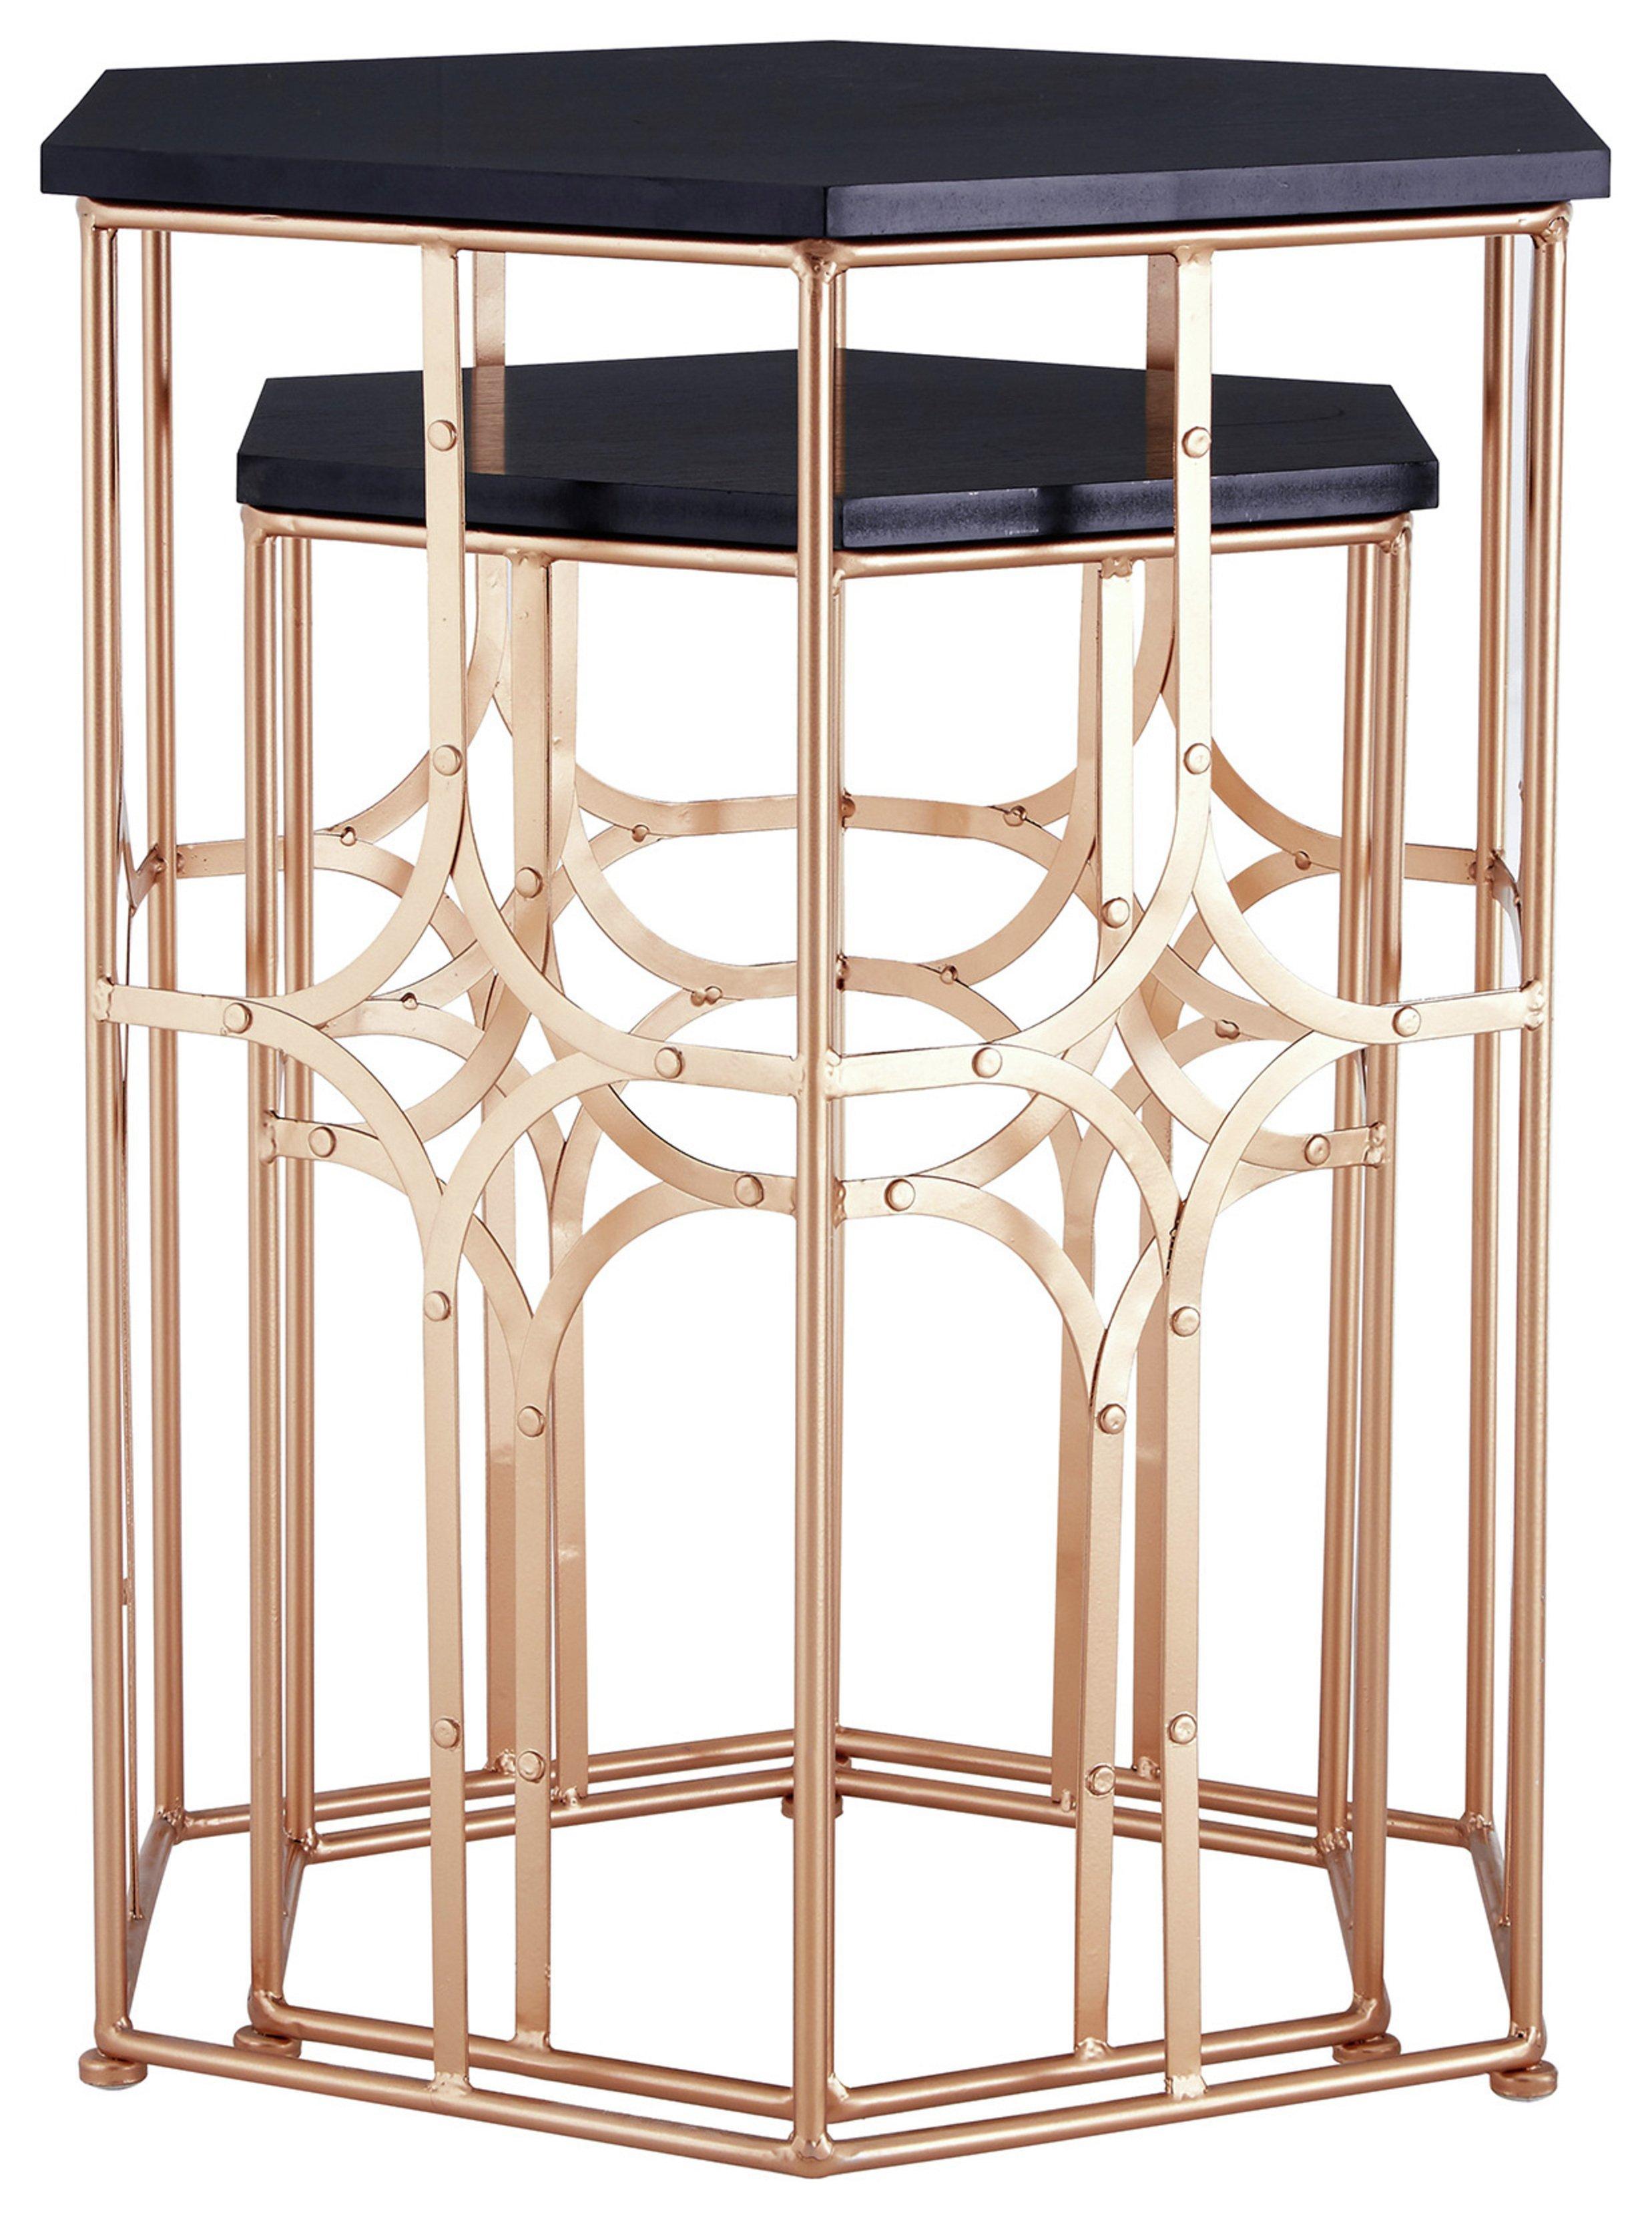 Premier Housewares Lexa Set of 2 Side Tables - Rose Gold